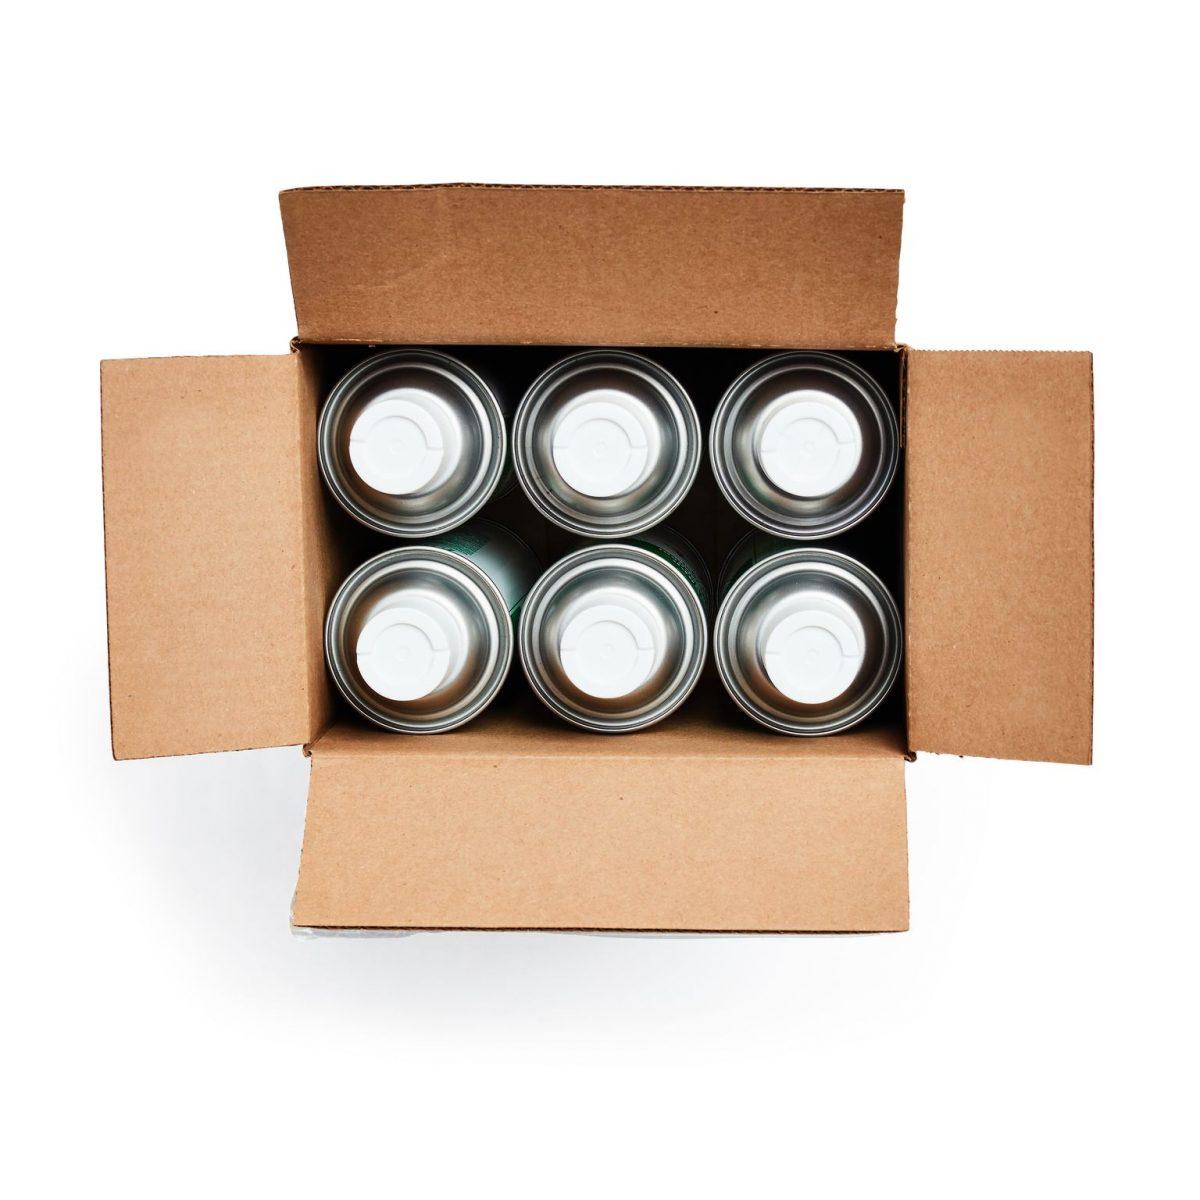 VpCI 238 Box